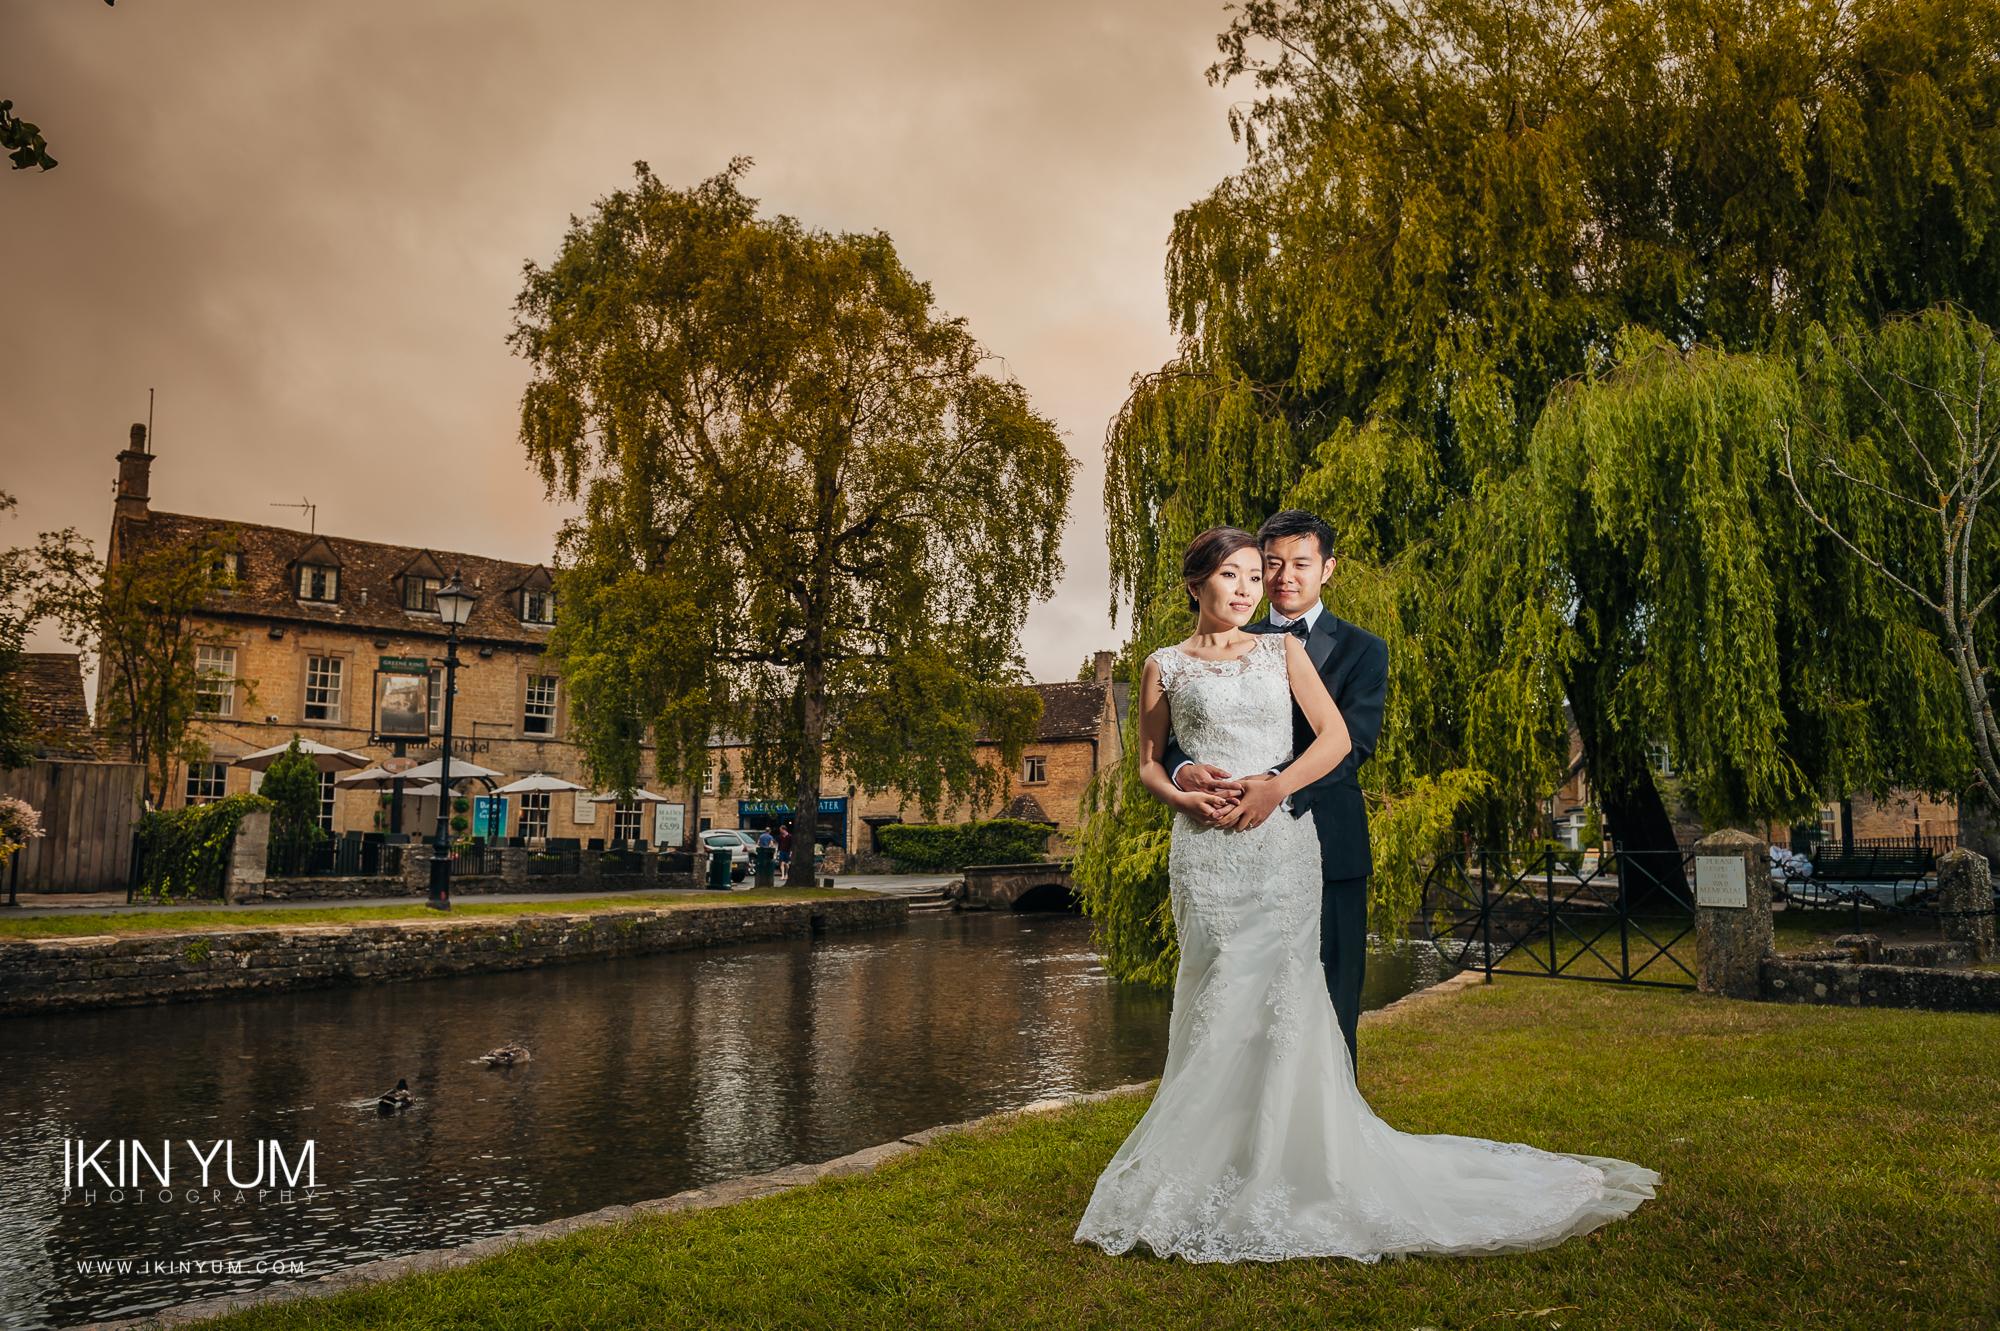 Carmen & Dennis Pre-Wedding Shoot - Ikin Yum Photography-010.jpg